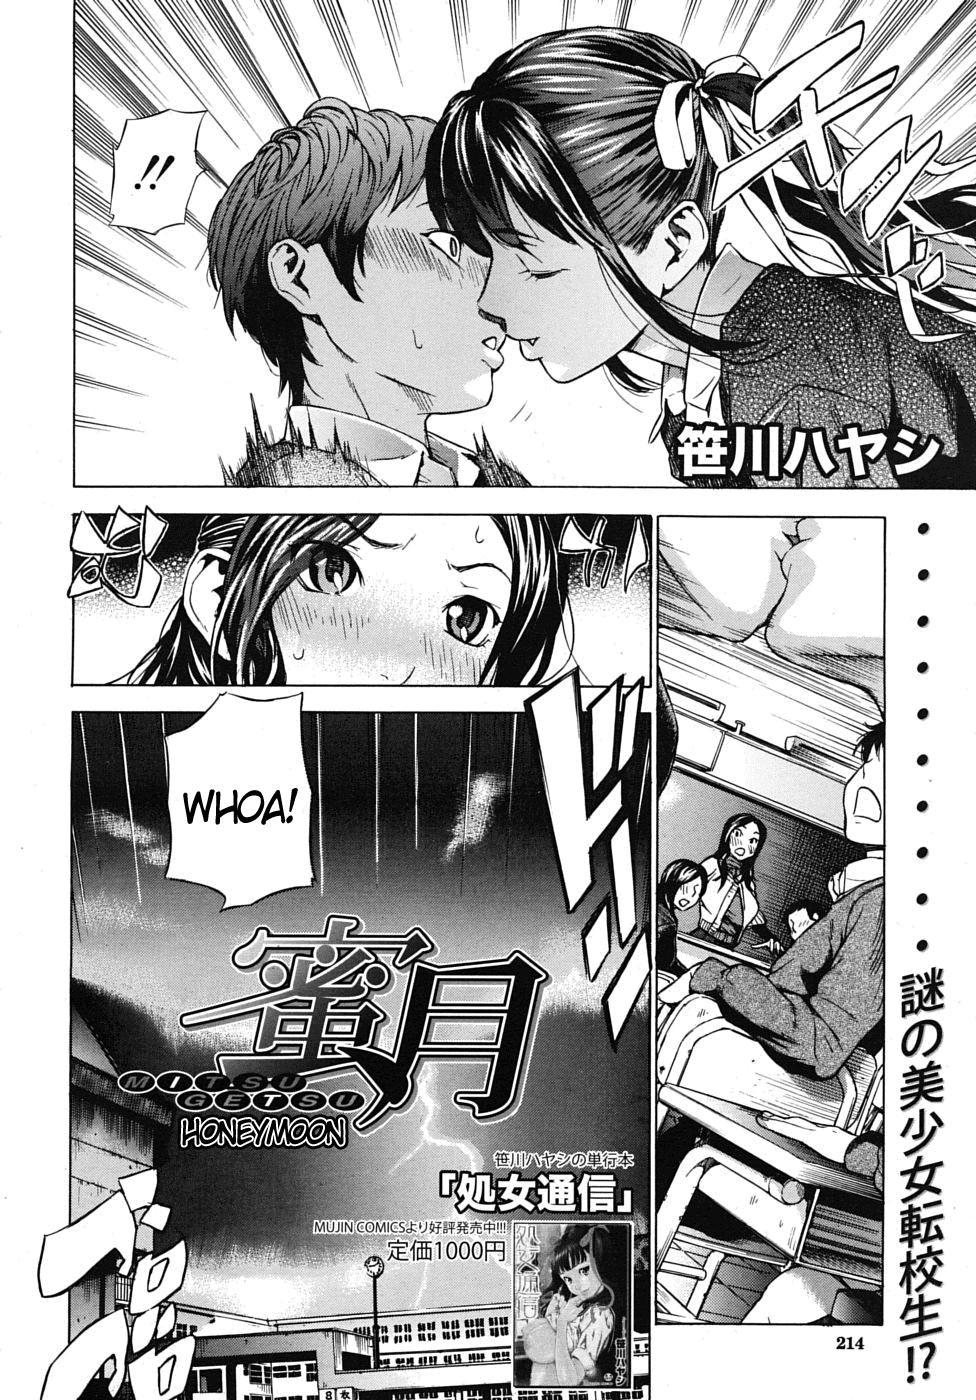 [Sasagawa Hayashi] Zutto Isshoni - Our Eternity Love Ch. 2-6 [English] [DGB] 27